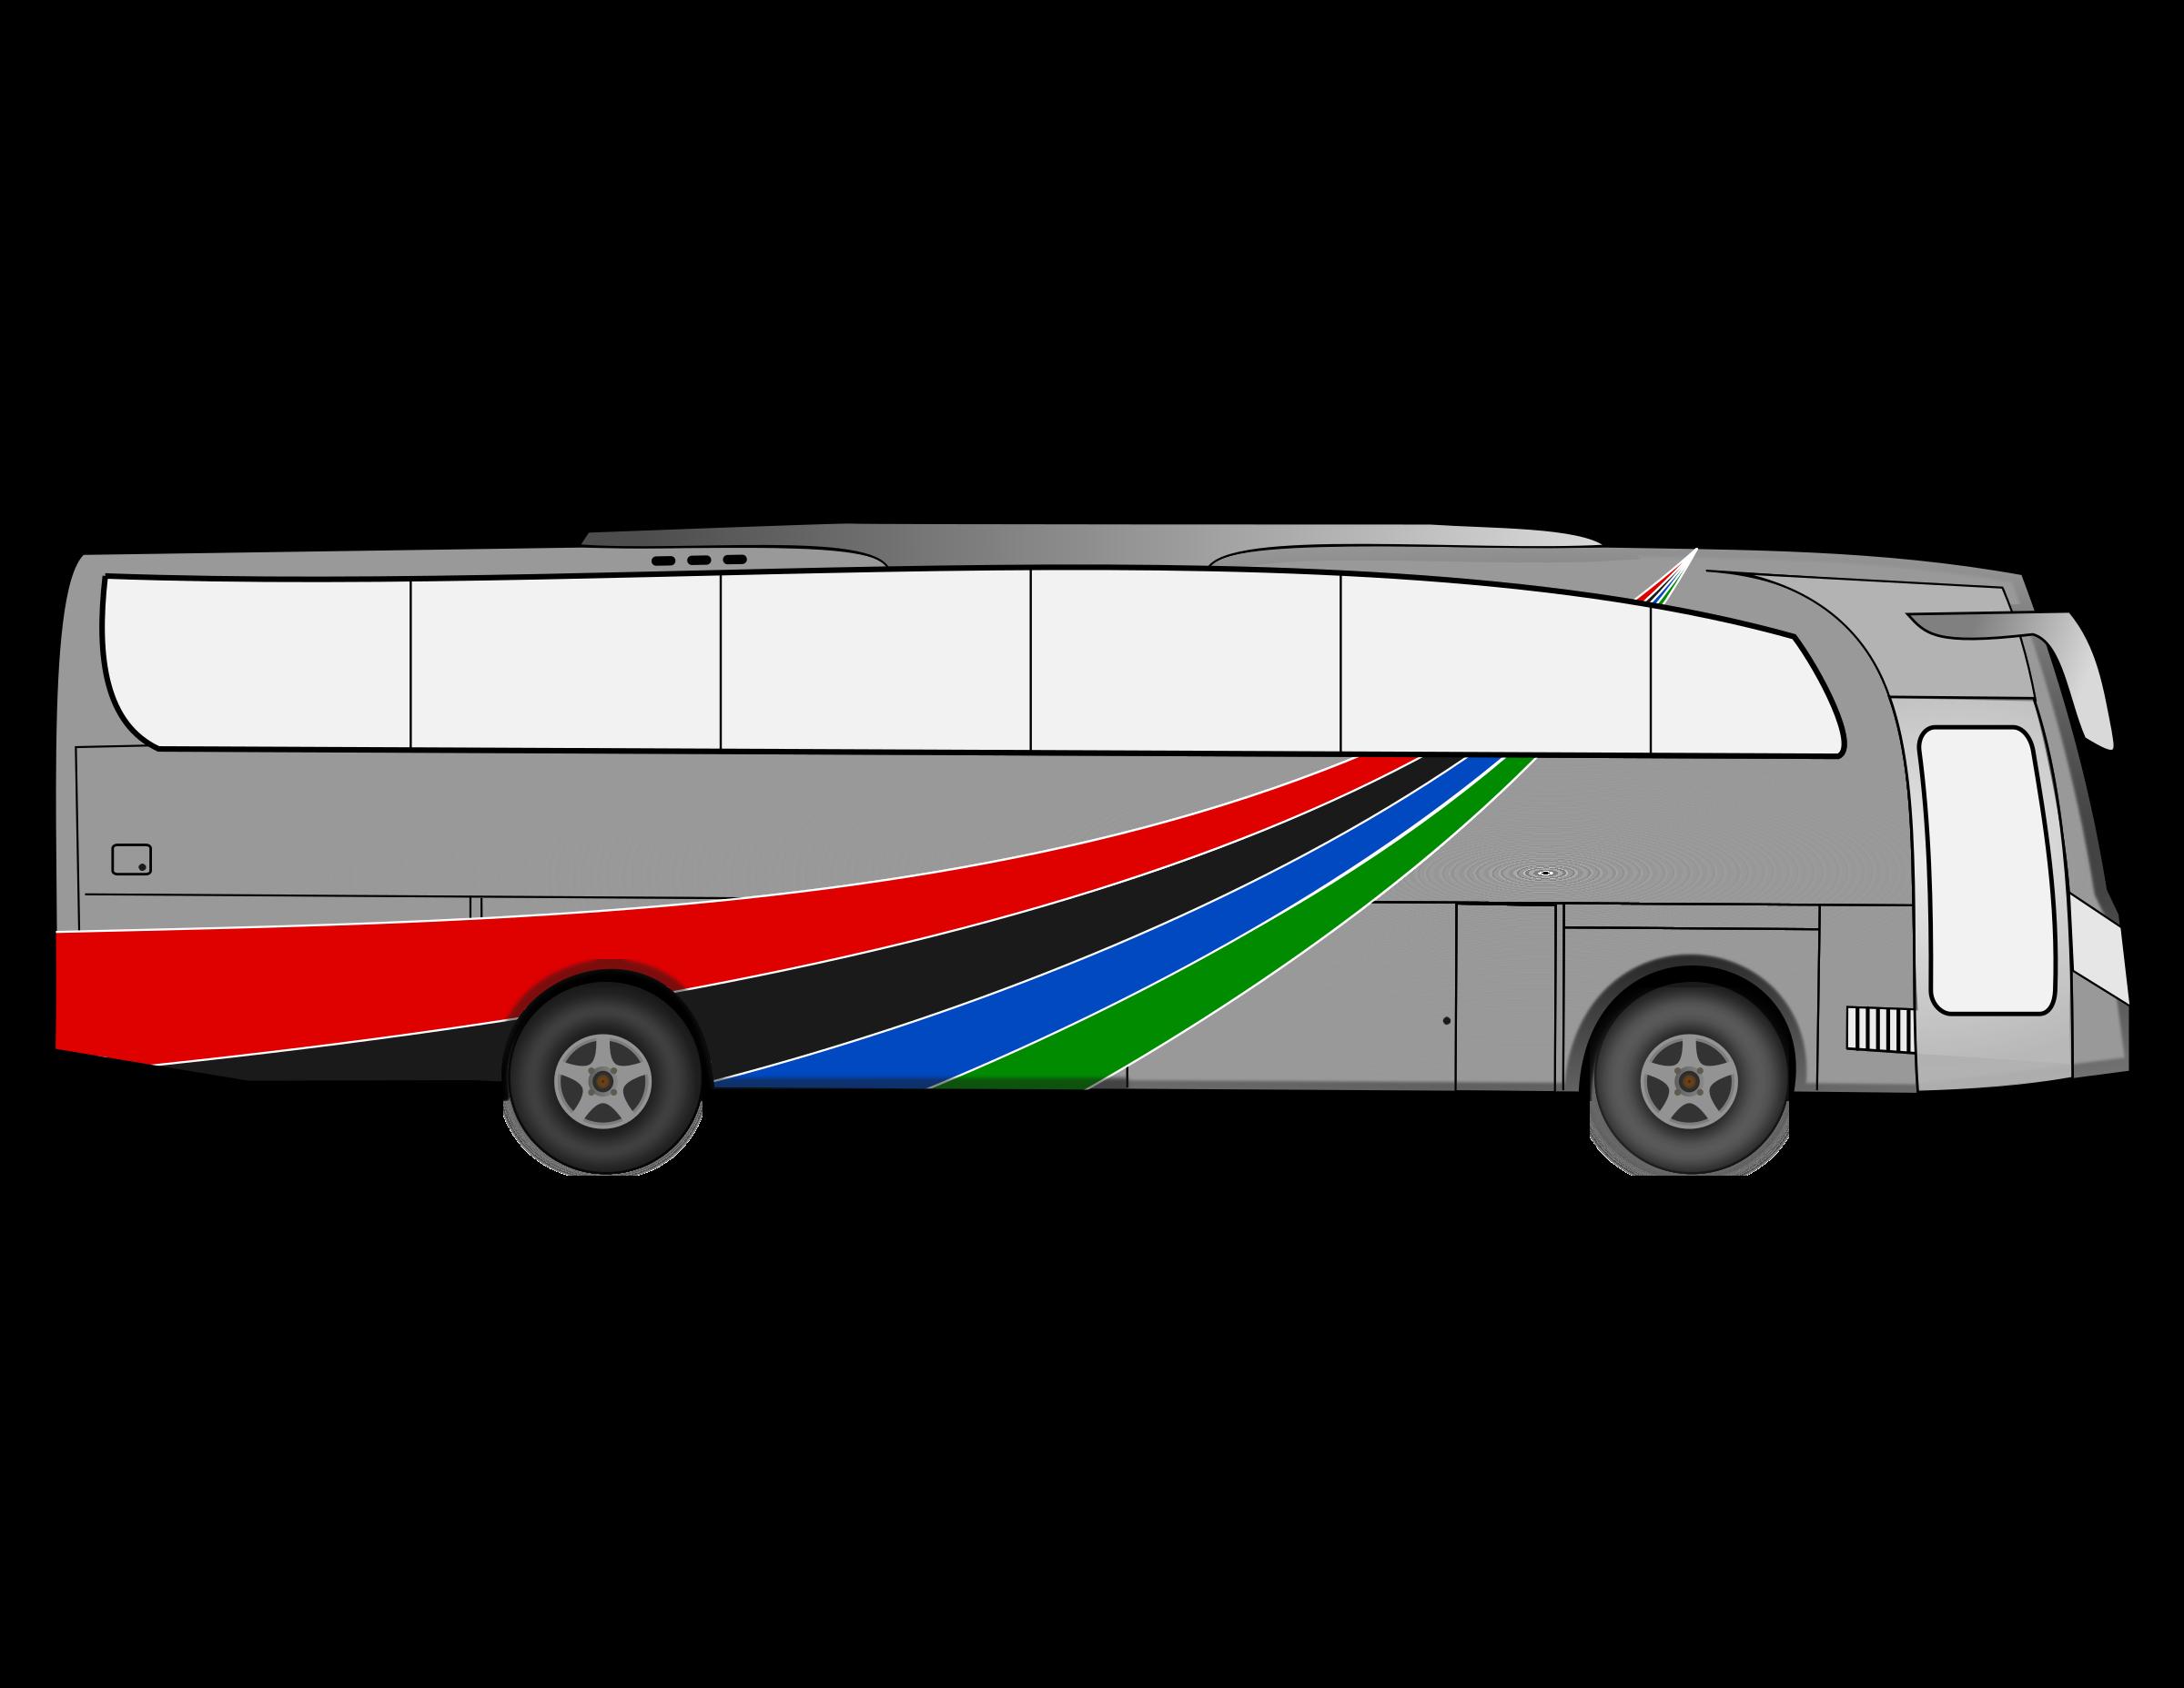 . Clipart bus land transport